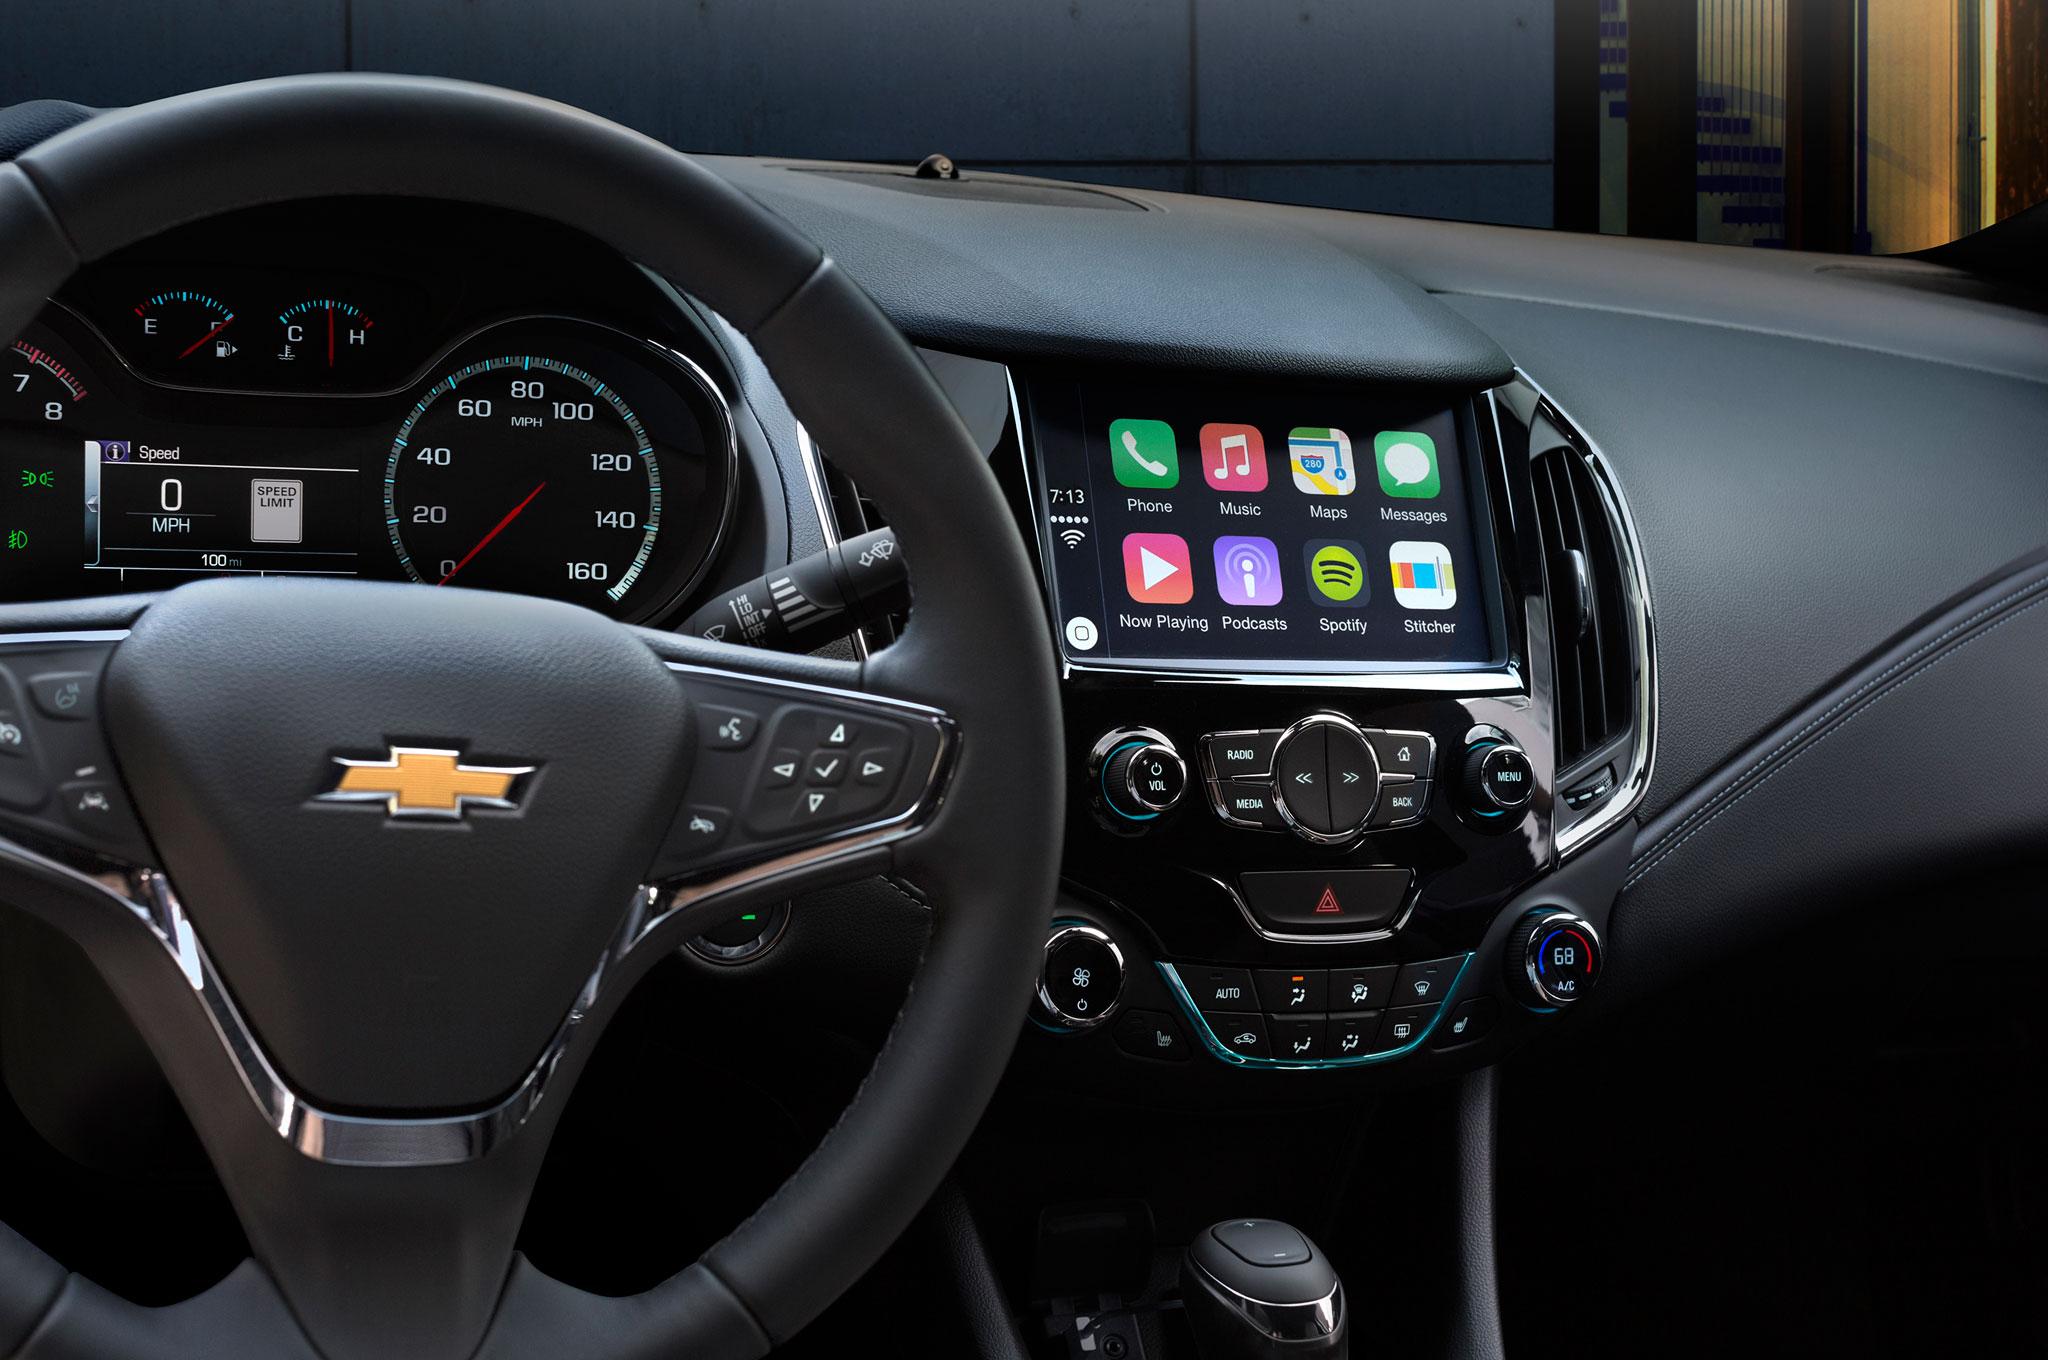 2016 Chevrolet Cruze Interior Center Stack